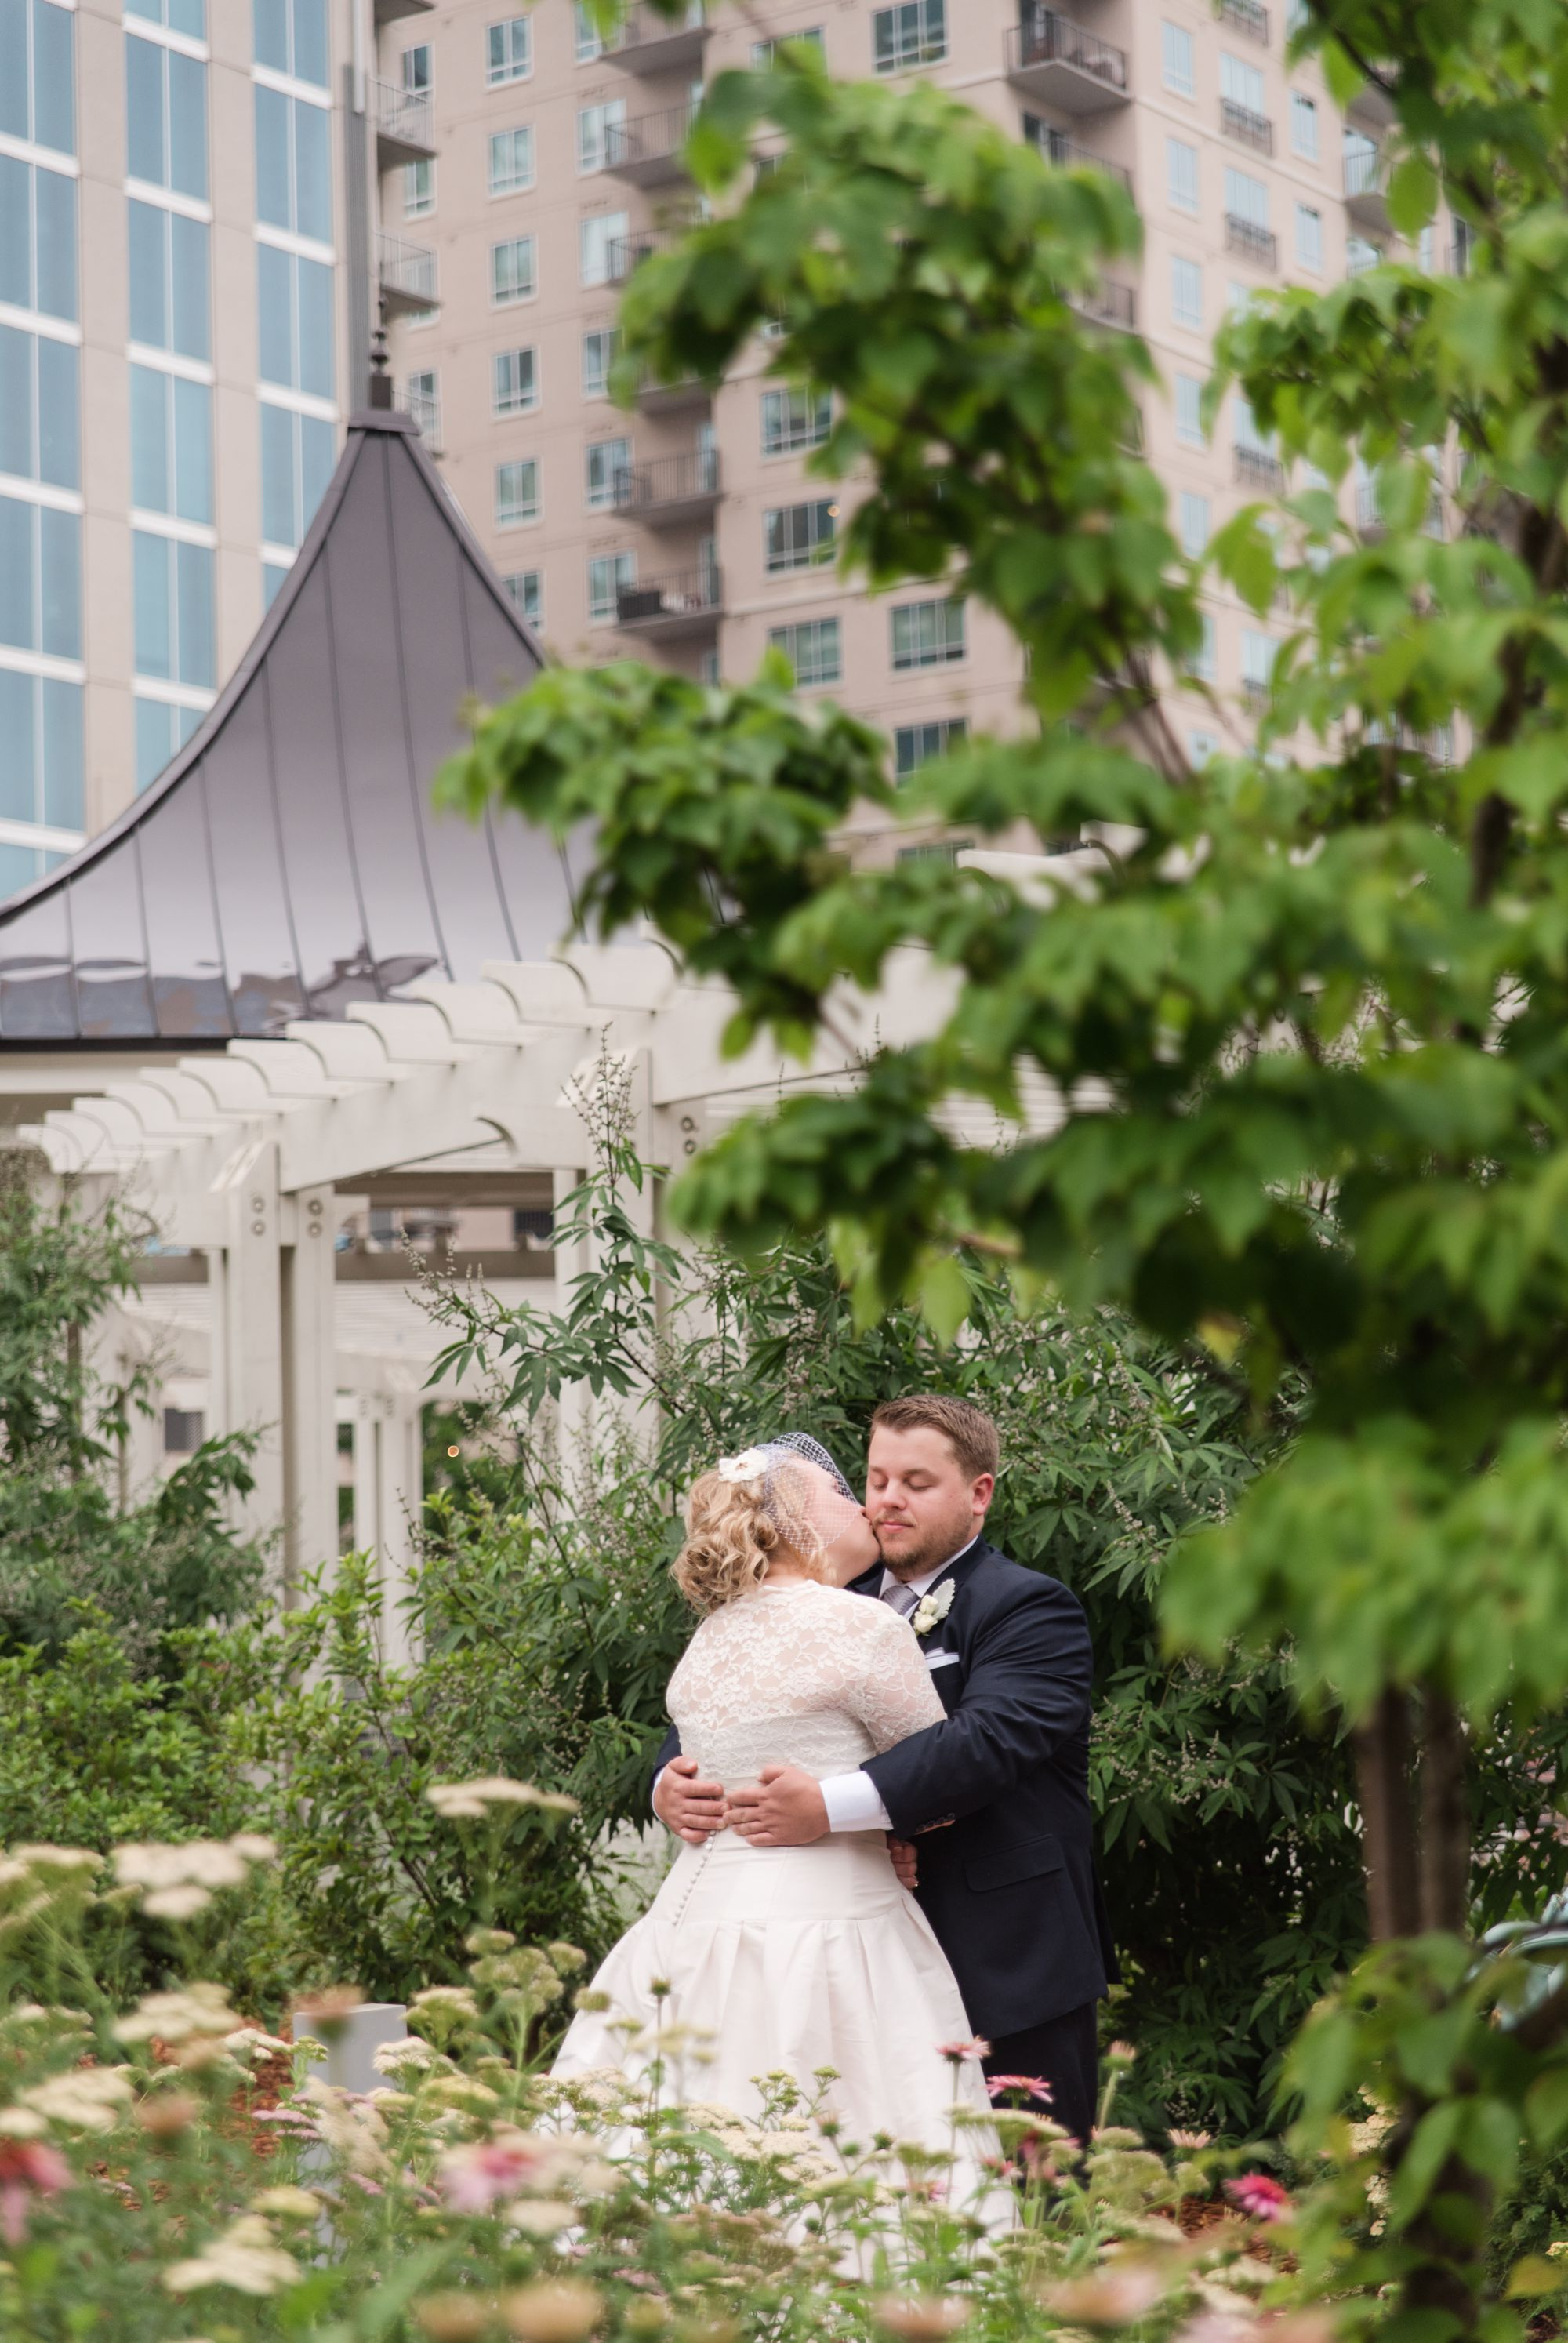 uptown-charlotte-warhouse-wedding 38